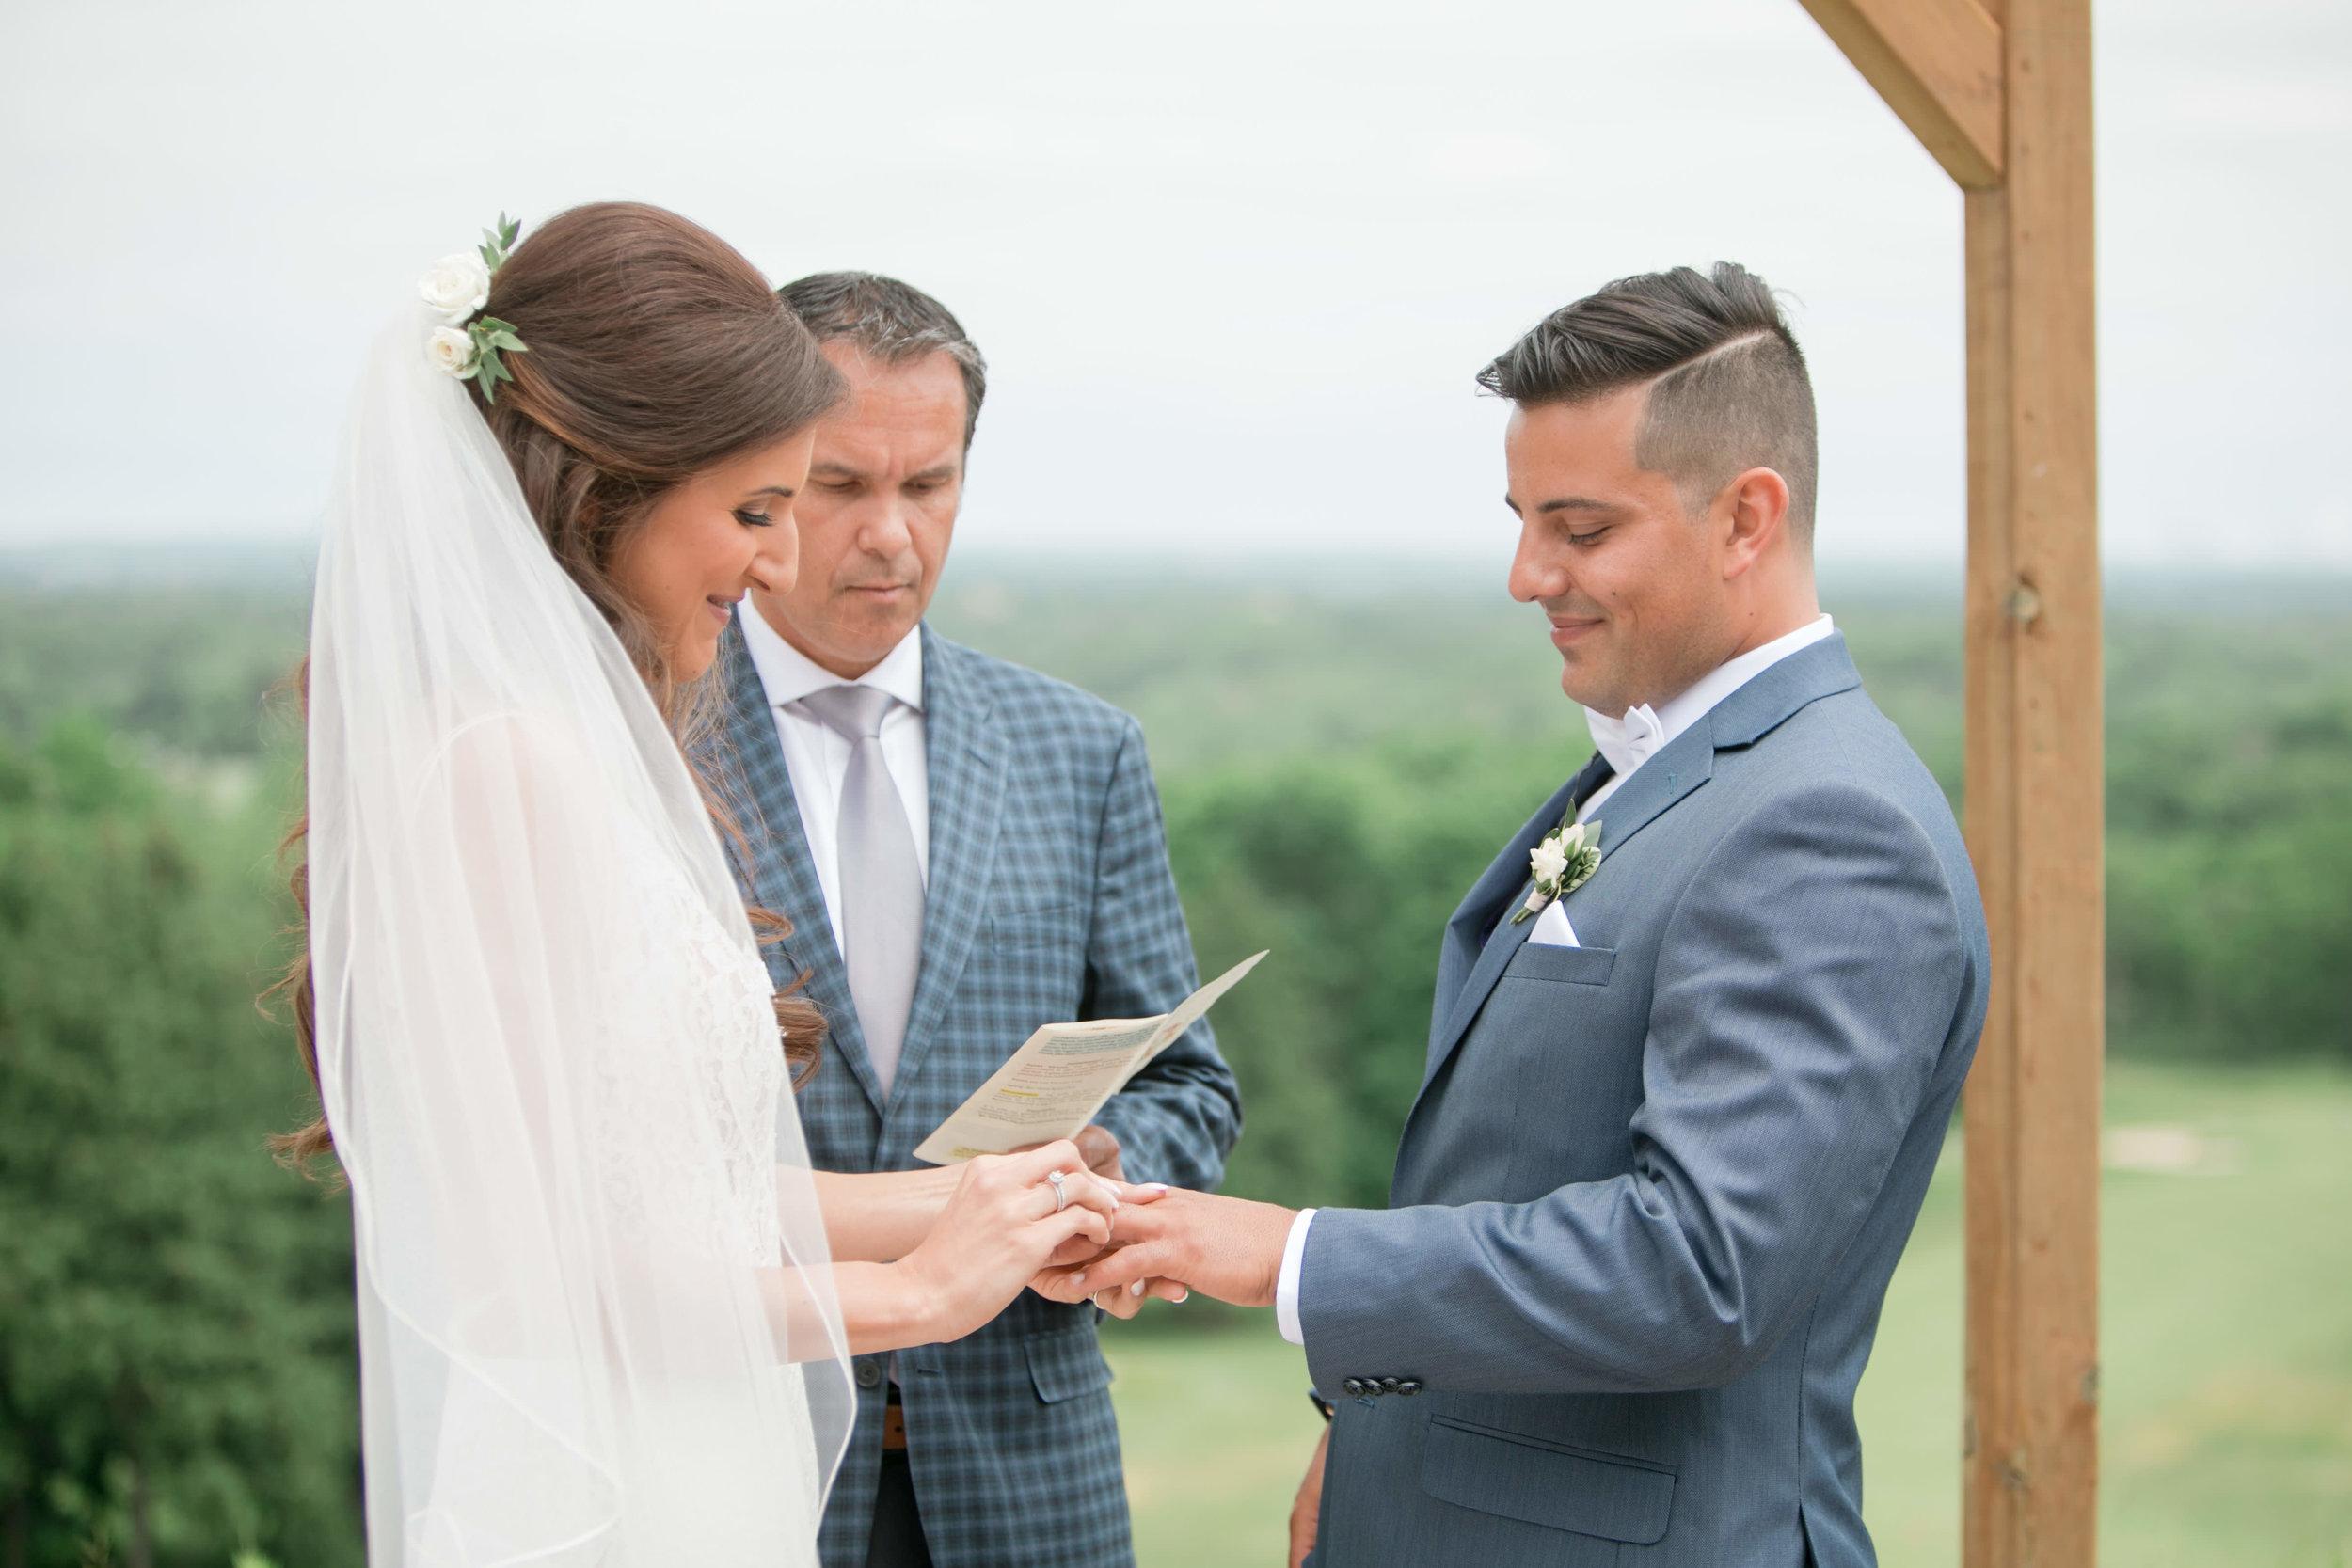 Miranda___Daniel___Daniel_Ricci_Weddings___High_Res._Finals_322.jpg